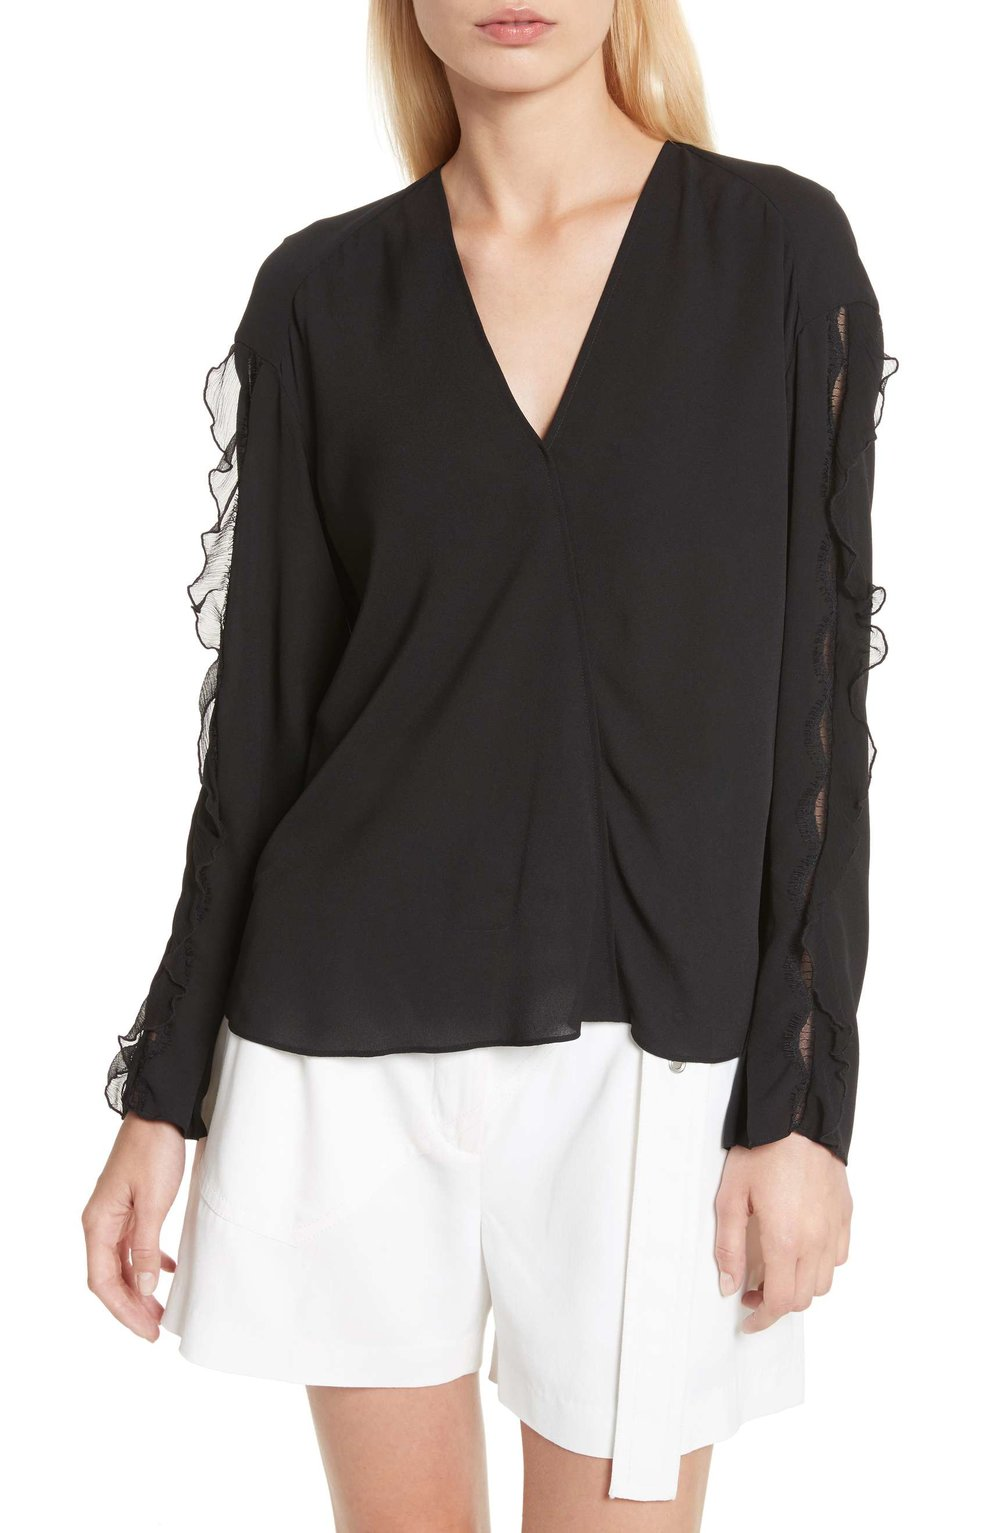 PHILIP LIM Ruffle sleeve silk blouse, $395 Nordstrom.com